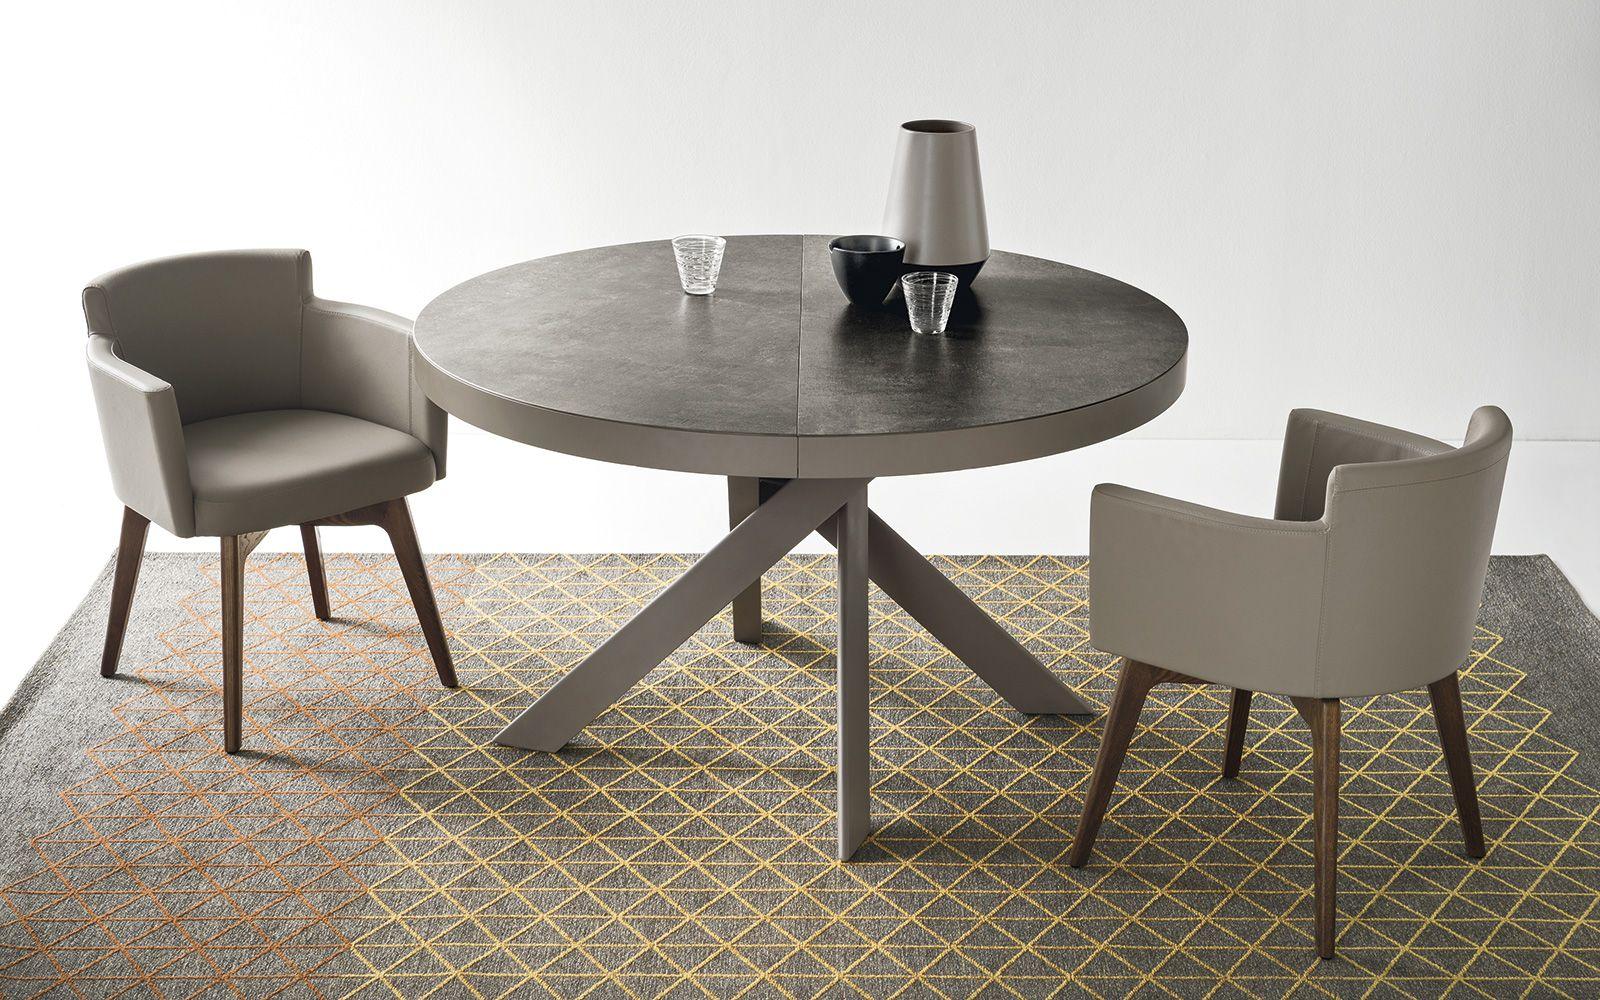 Design dining table TIVOLI - Calligaris CS/4100 | Dining ...